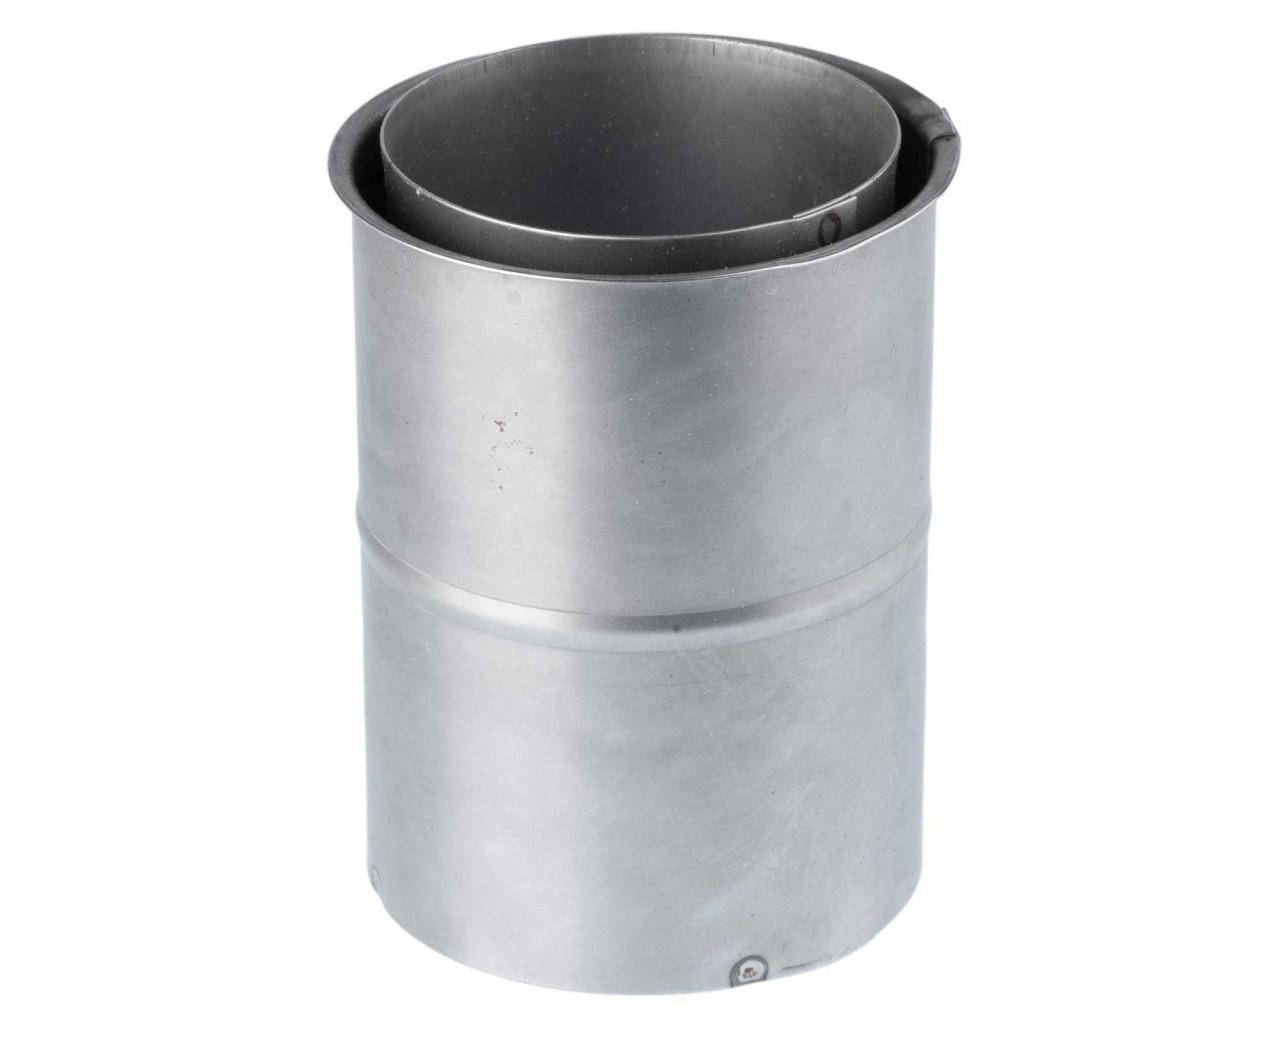 Doppelwandfutter120 mm lang Stahl Wandfutter für PelletofenAnschluss Doppelwandfutter aus Stahlfür wählbaren Querschnitt 80 mm oder 100 mmzum Anschluss von Pelletofenrohren an Schornsteinzüge. gefertigt gemäß DIN EN 18562 Wandstärke 1,2 mm wählbar